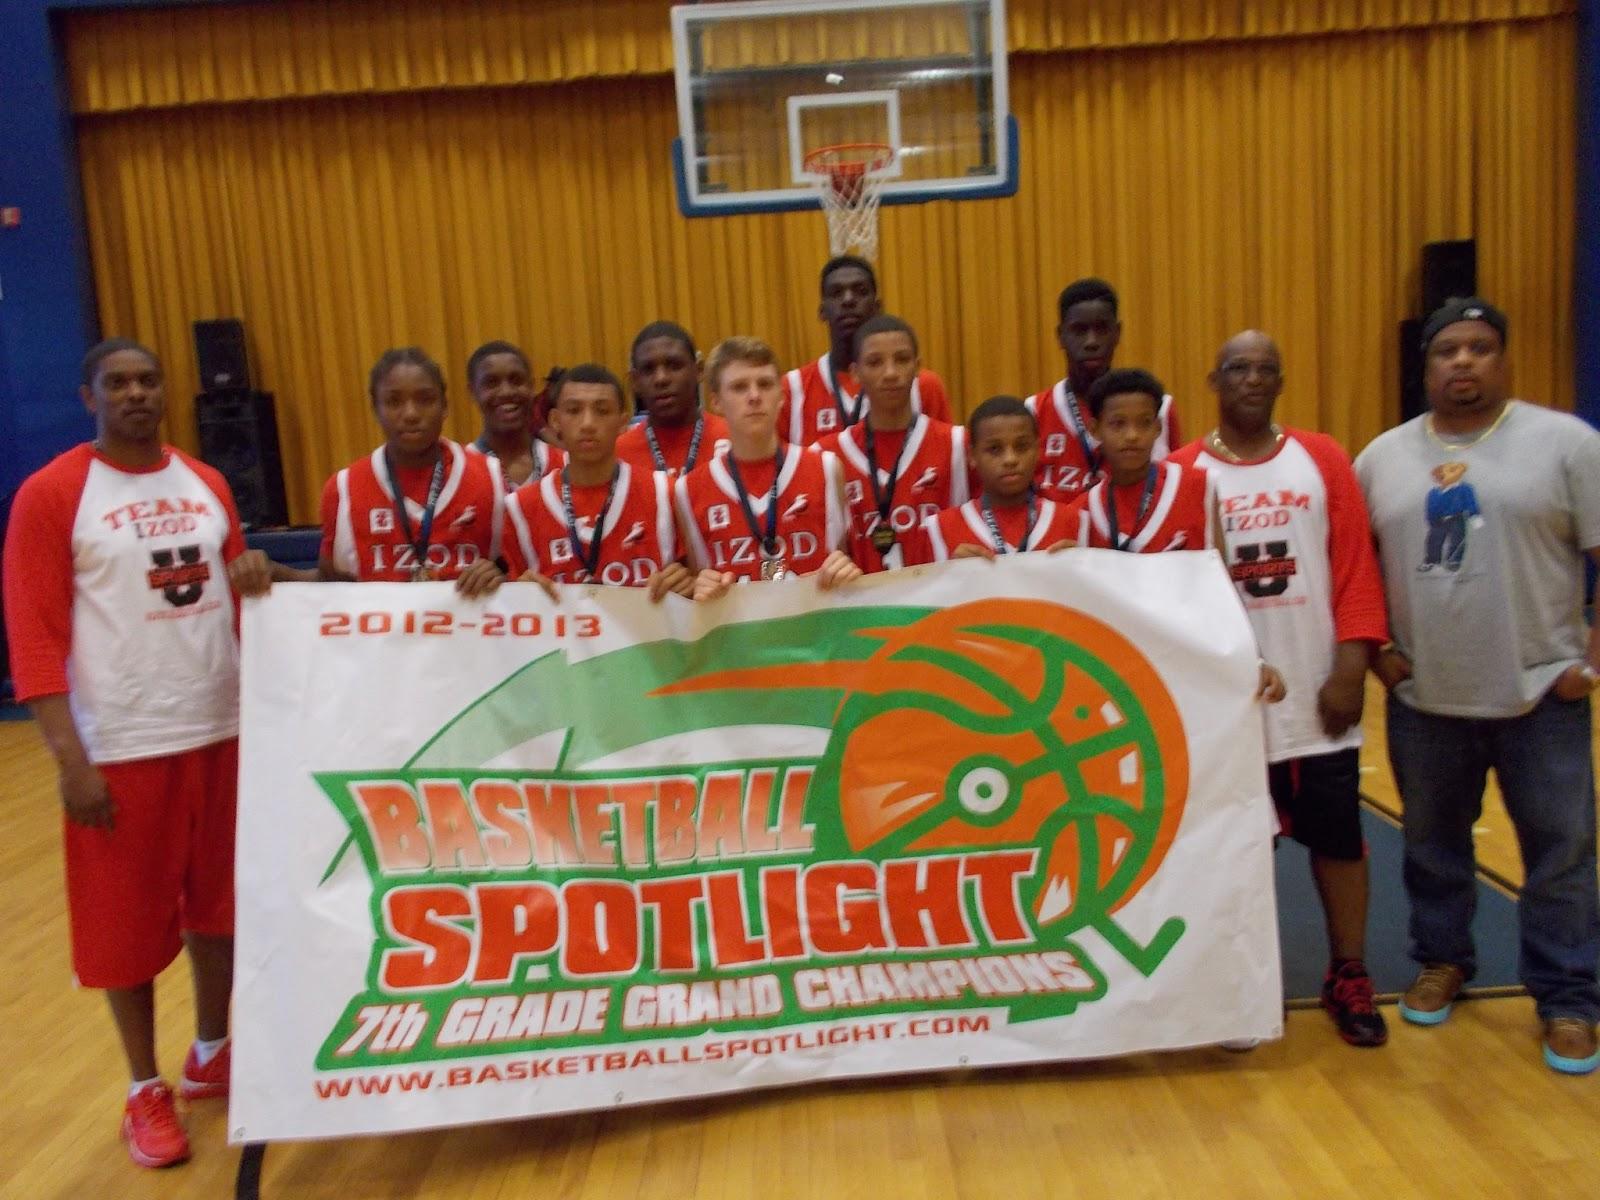 924fd55aae1d Basketball Spotlight 7th Grade Grand Championship Recap  Supreme Team  Answers The Bell!